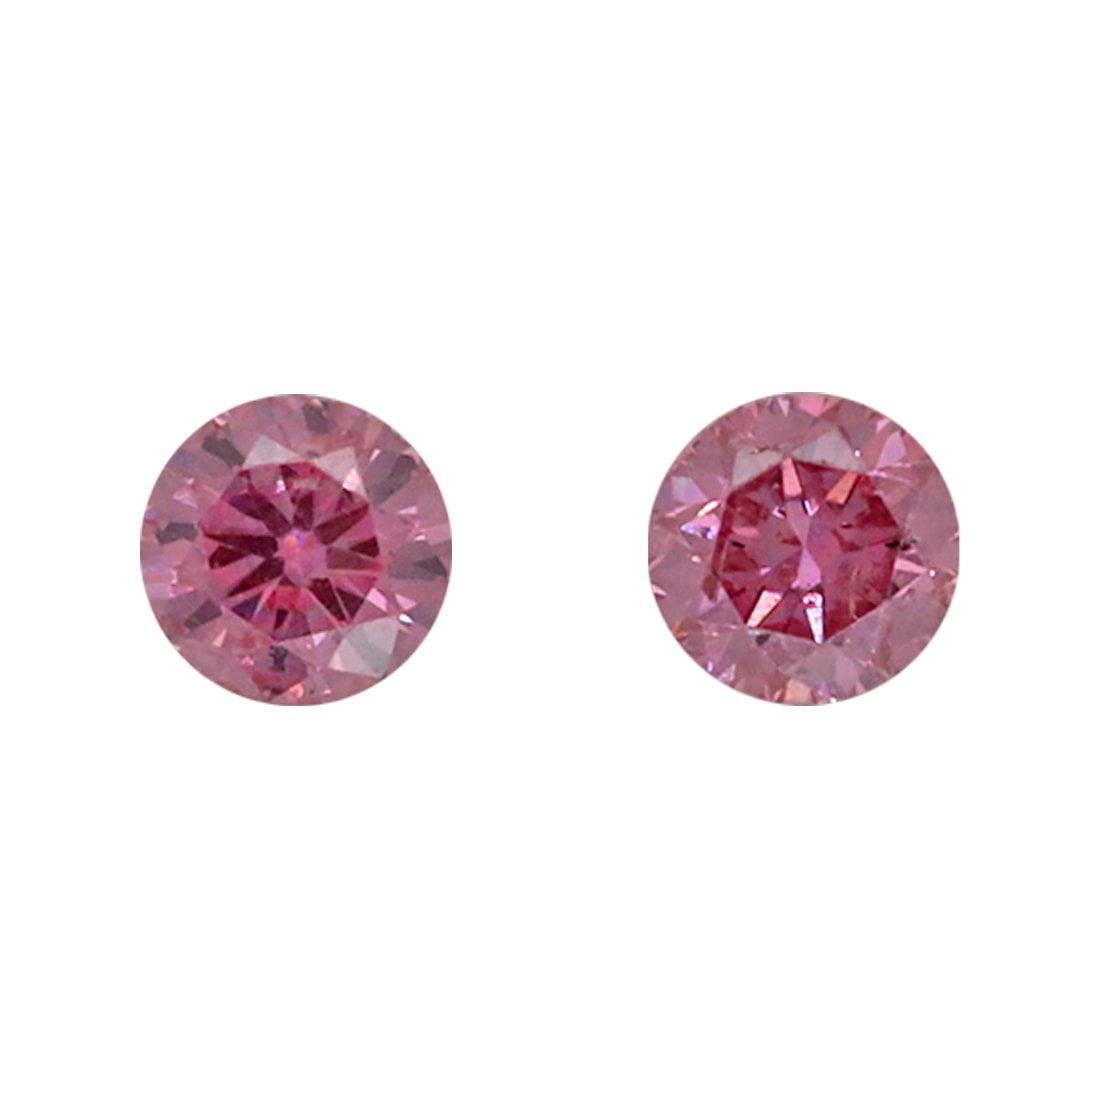 2=0.08ct Natural Fancy Vivid Pink, 3PP, SI2, Argyle Pink Diamond